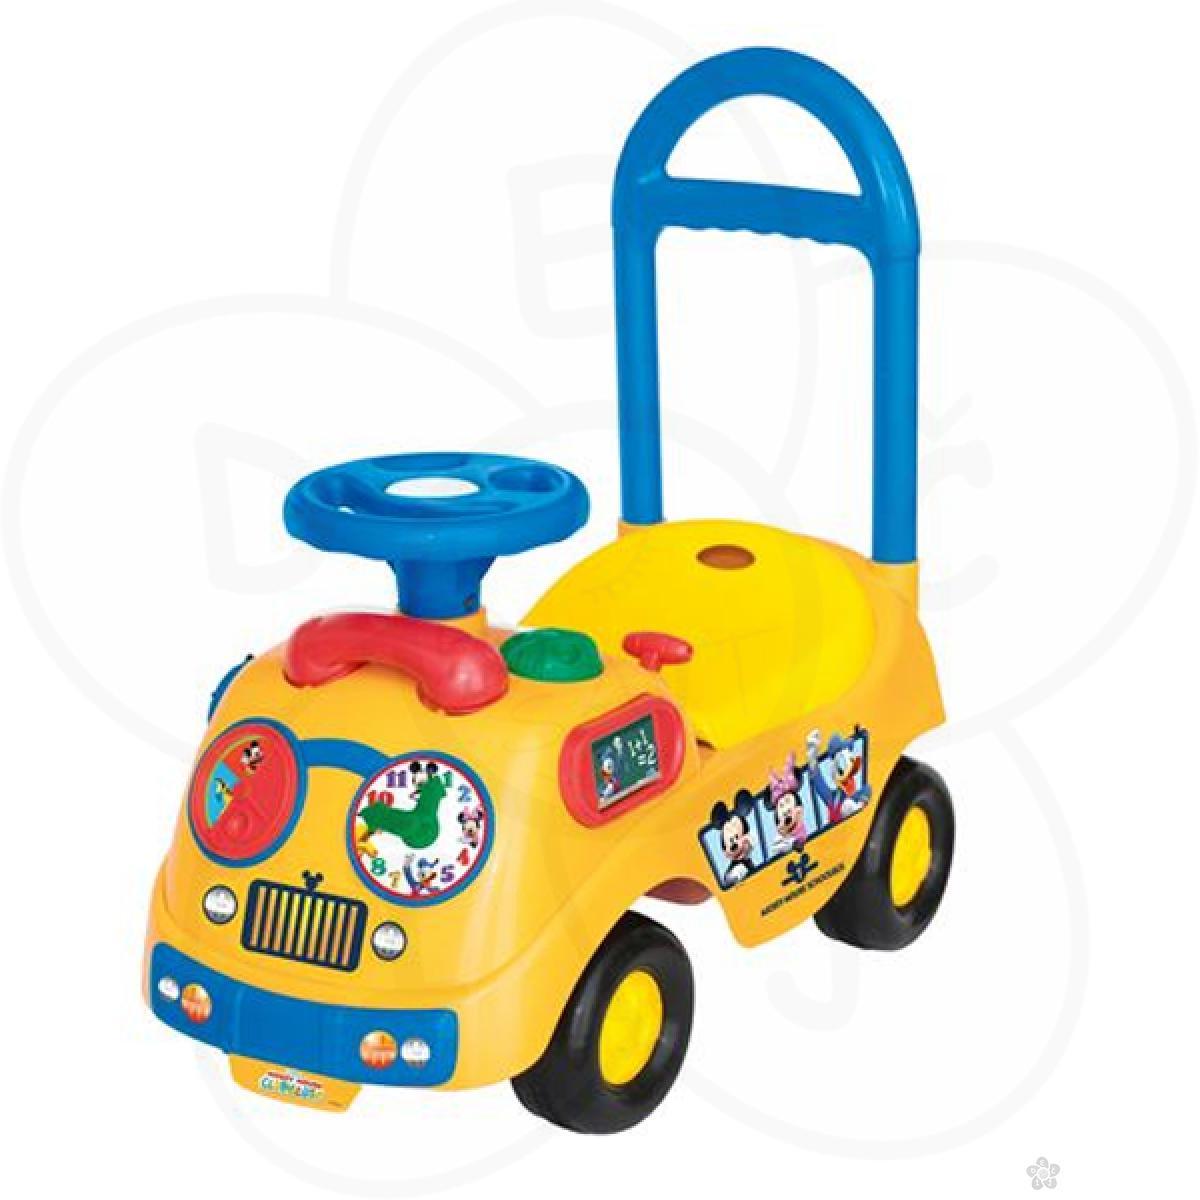 Guralica Kiddieland Mickey schoolbus, 0124688